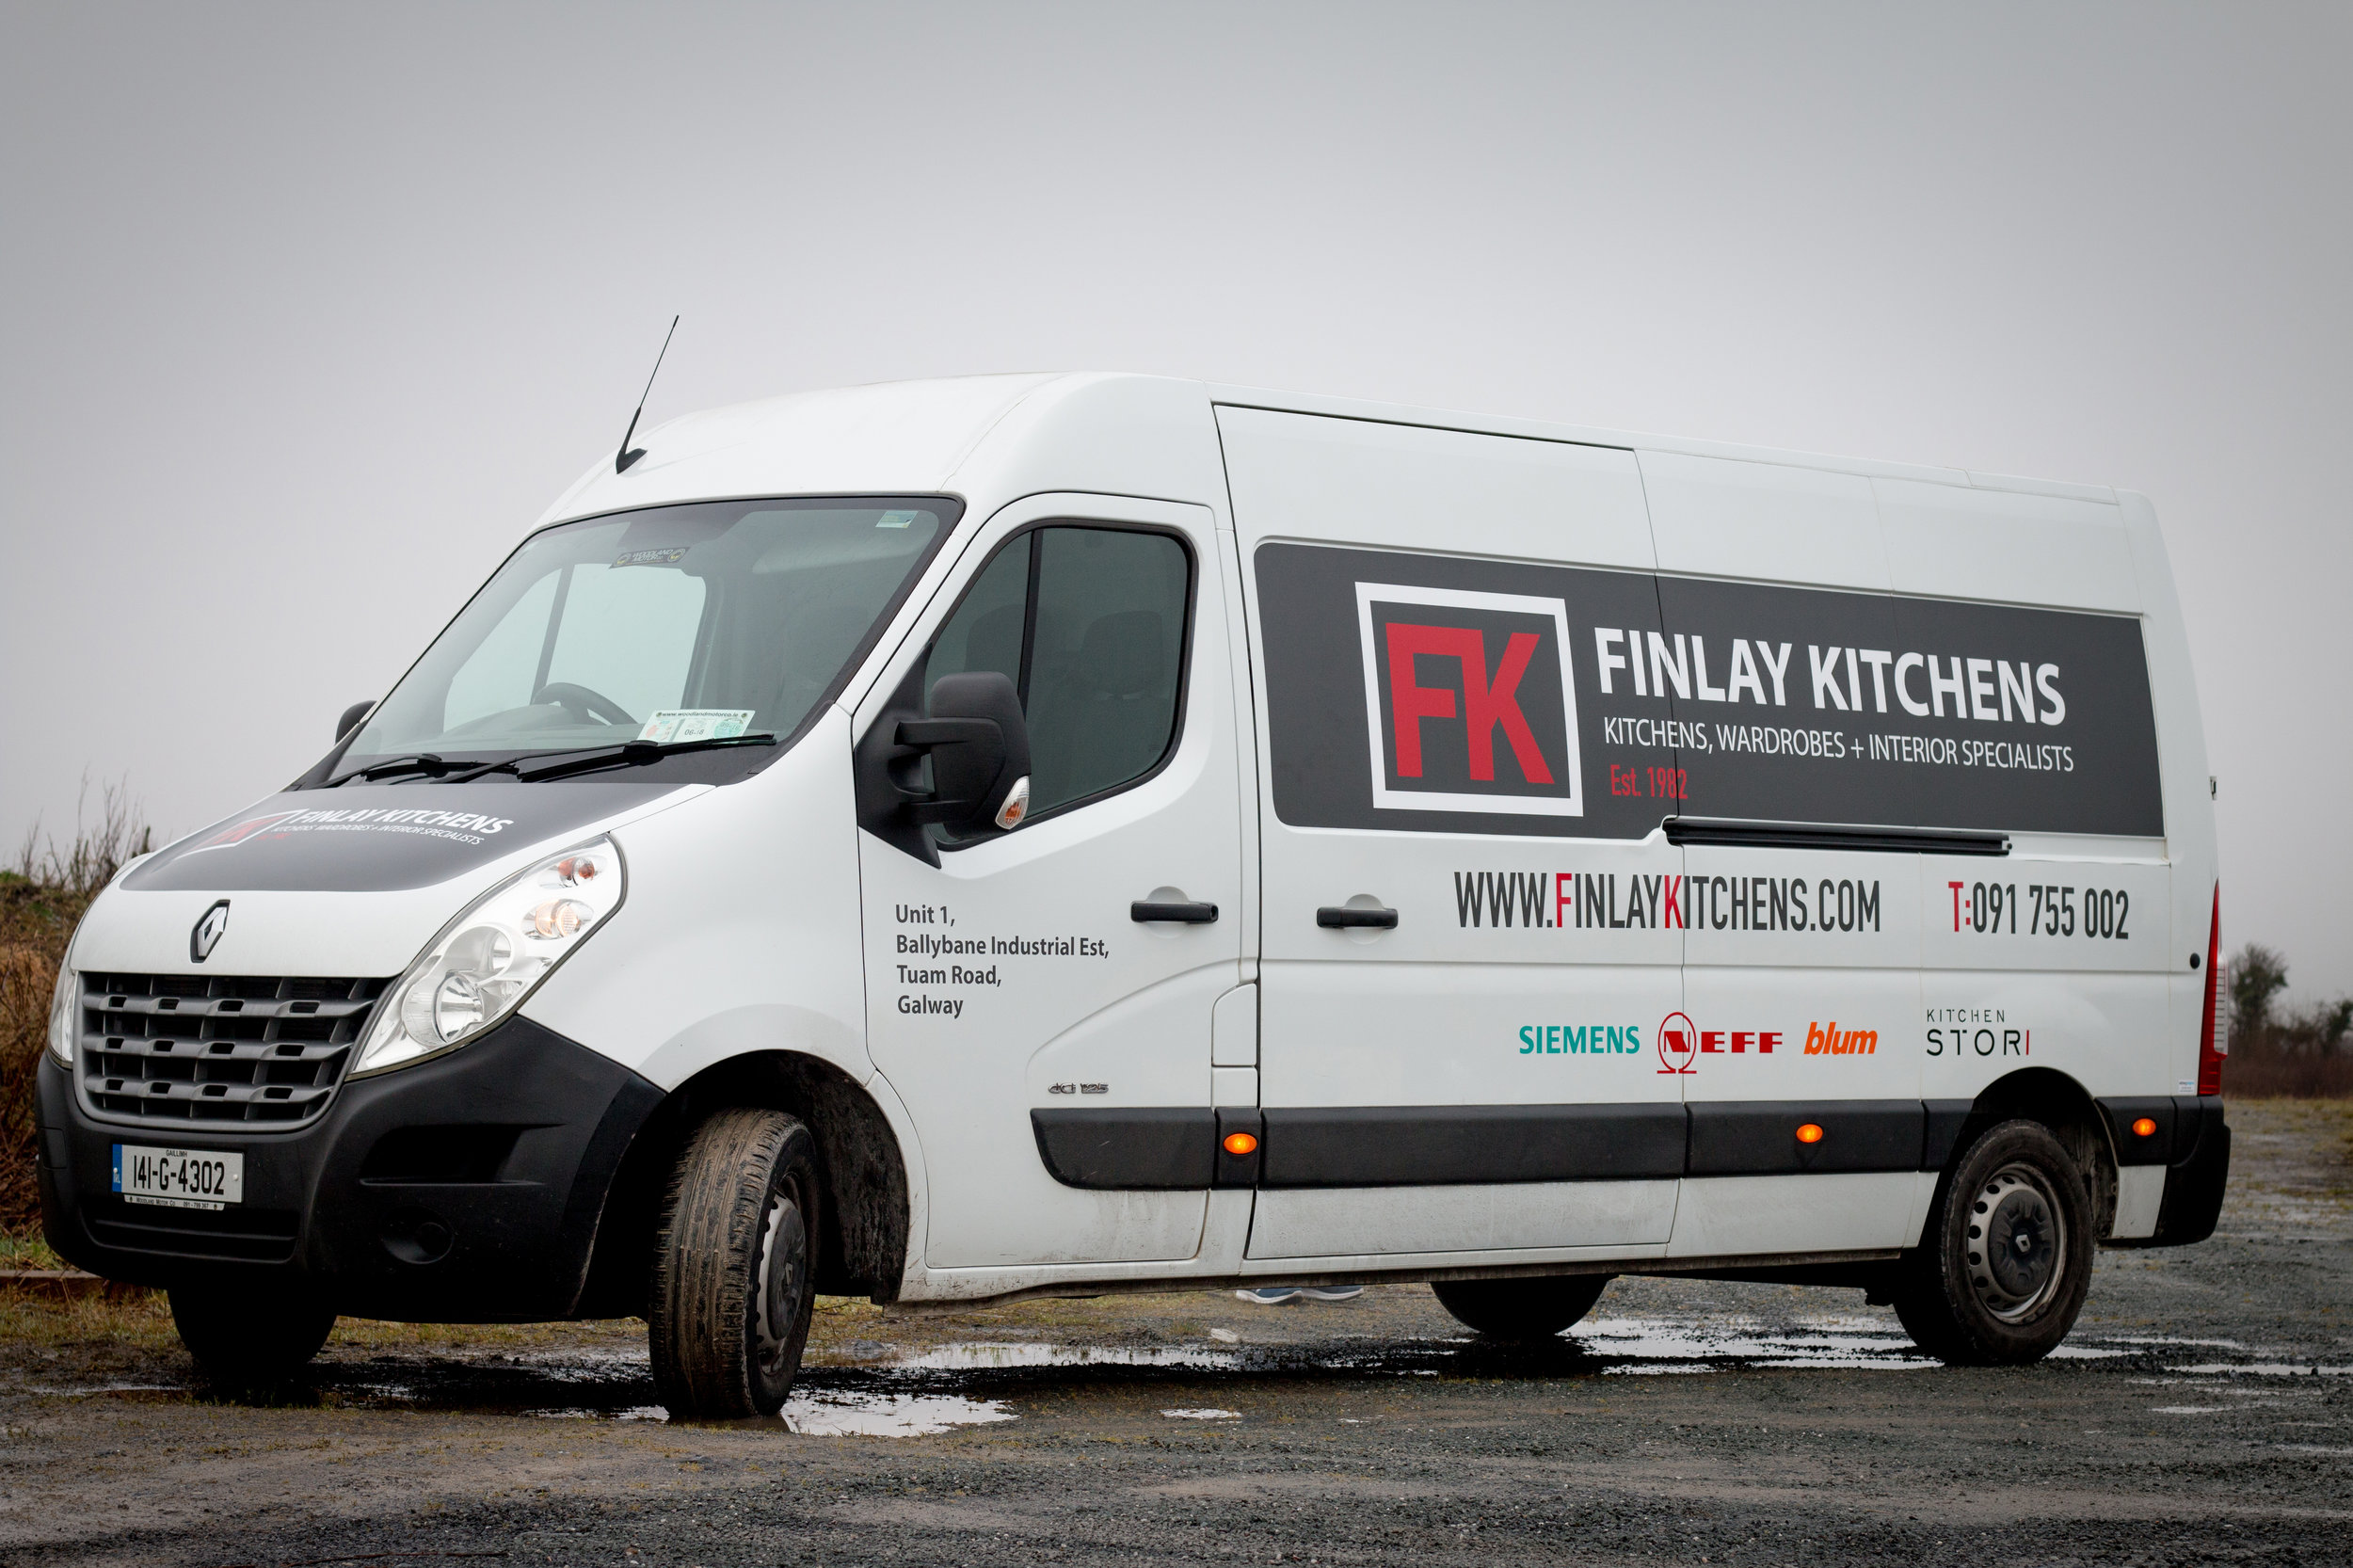 Finlay Kitchens